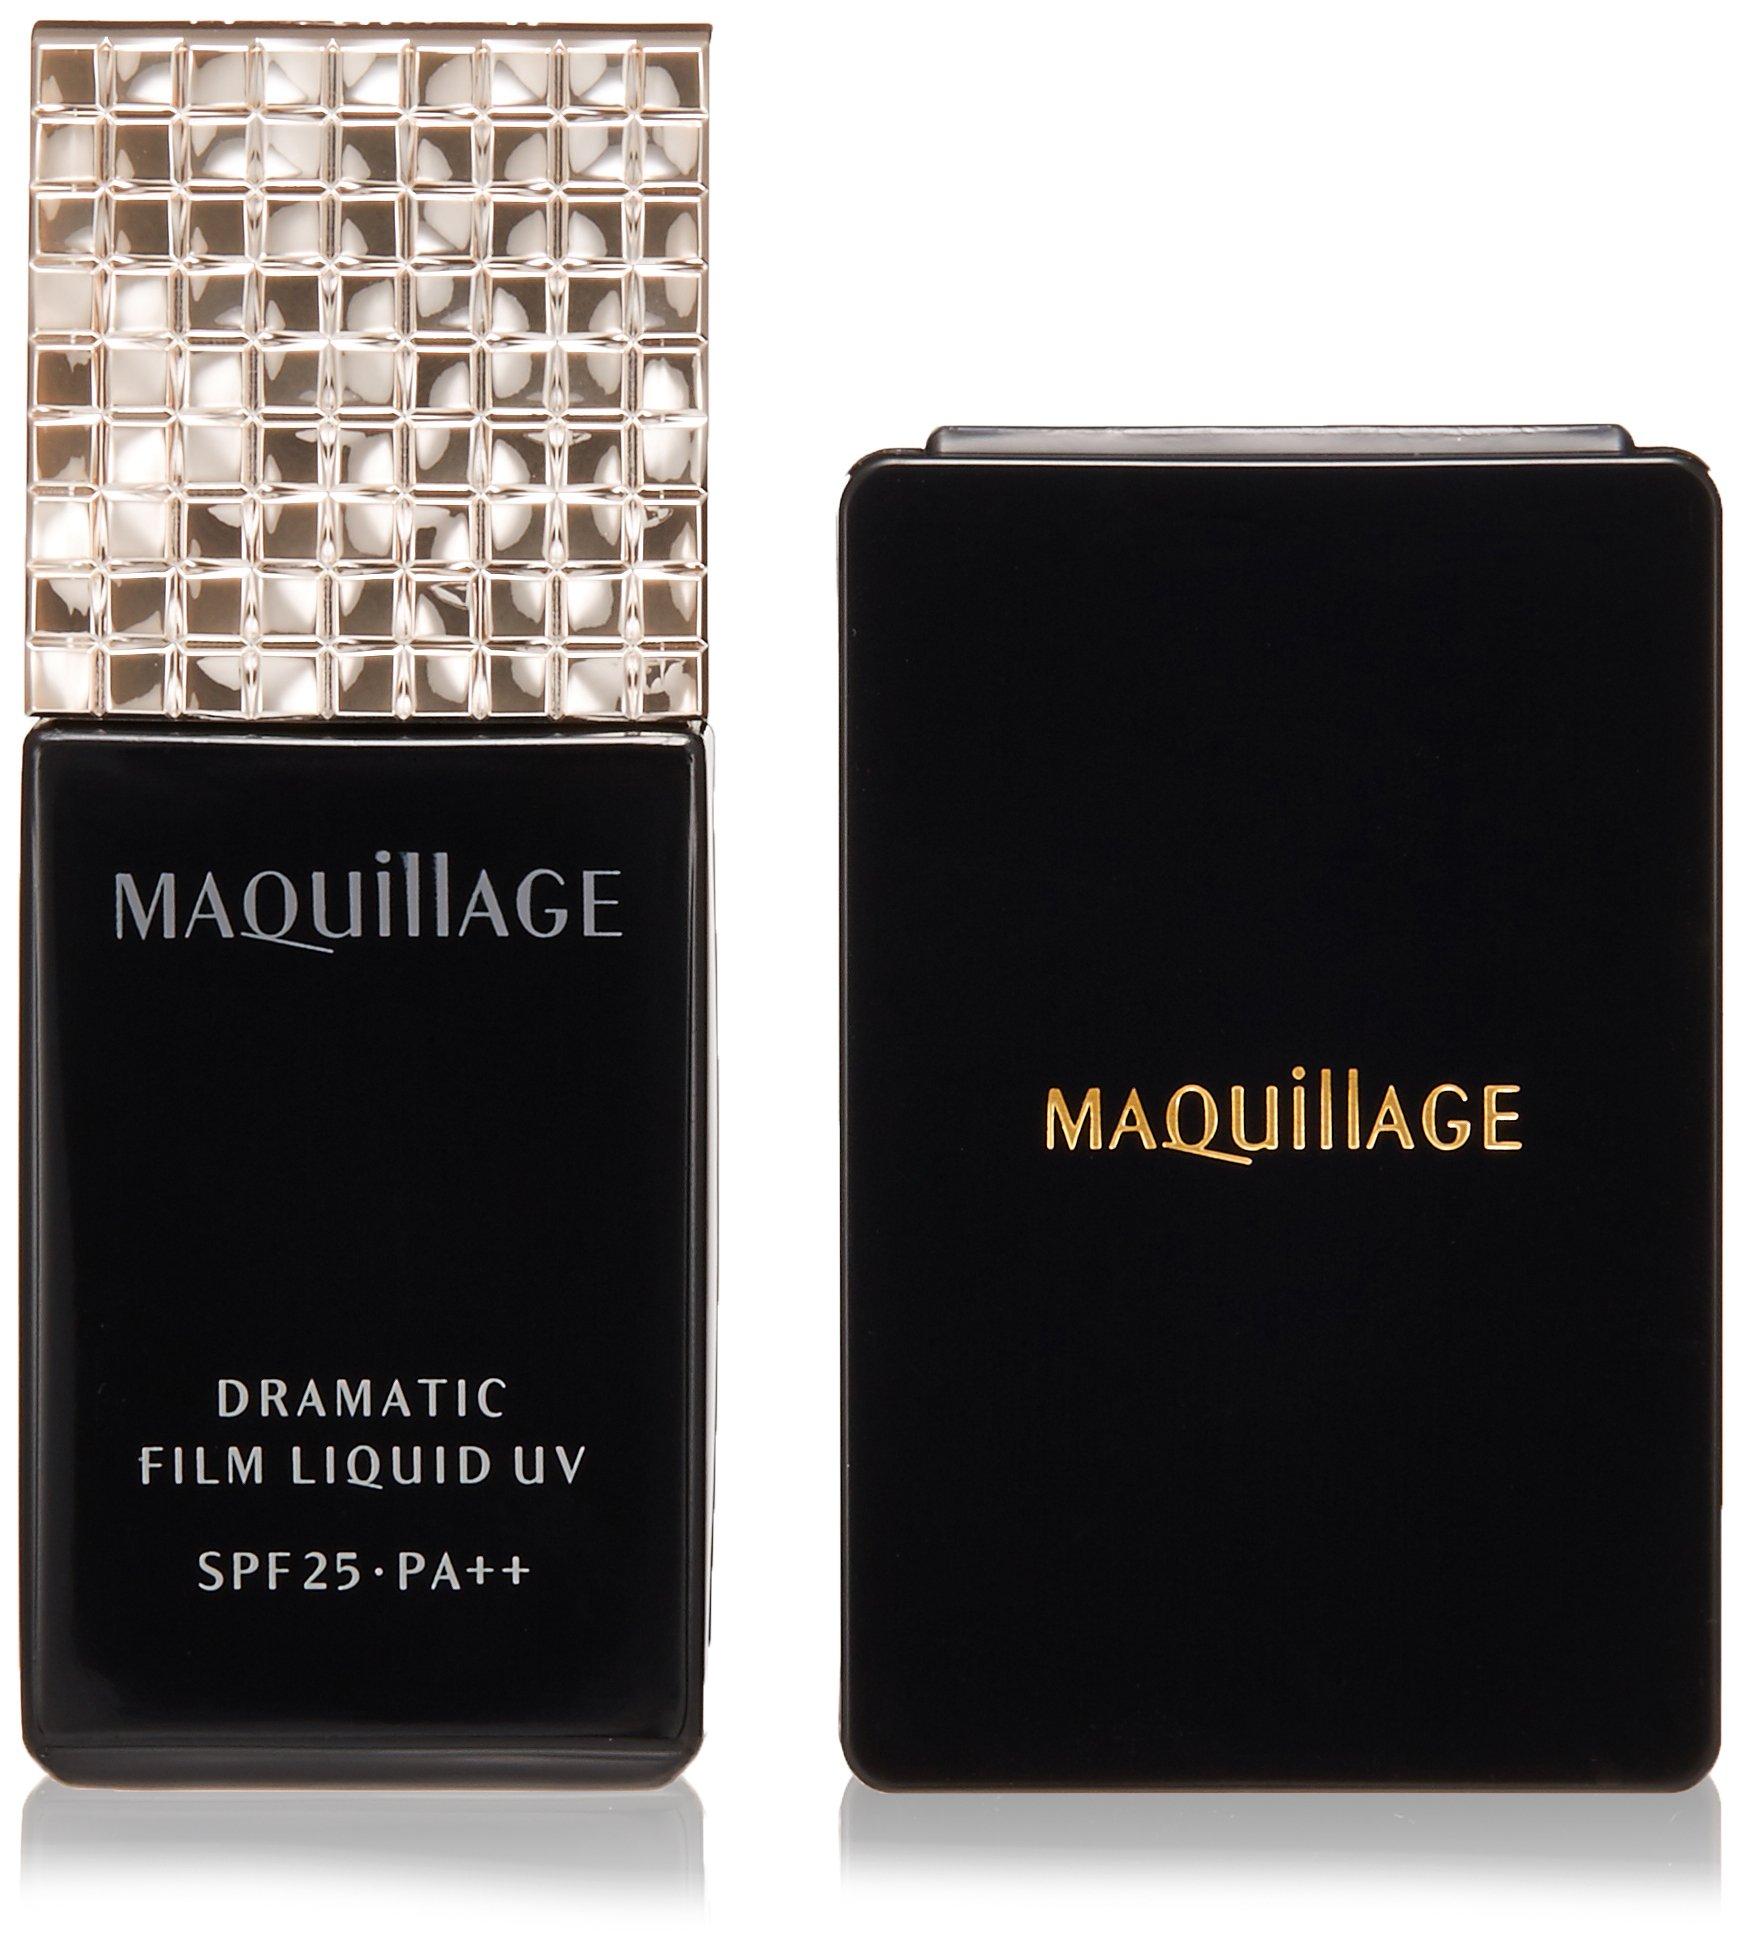 Shiseido MAQuillAGE Dramatic Film Liquid UV #OC20